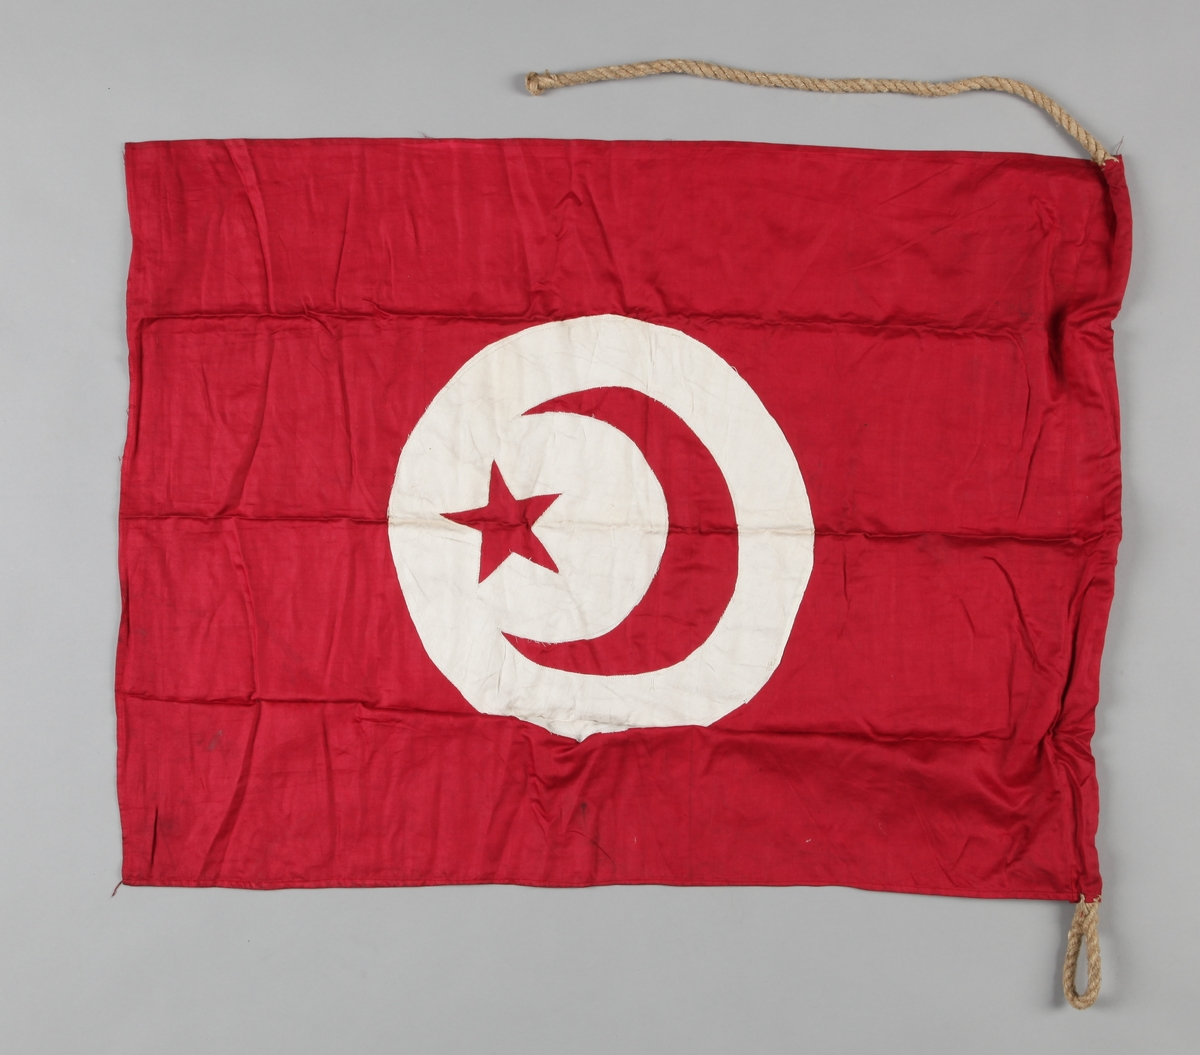 Rødt flagg med rund sirkel med halvmåne og stjerne i hvitt.